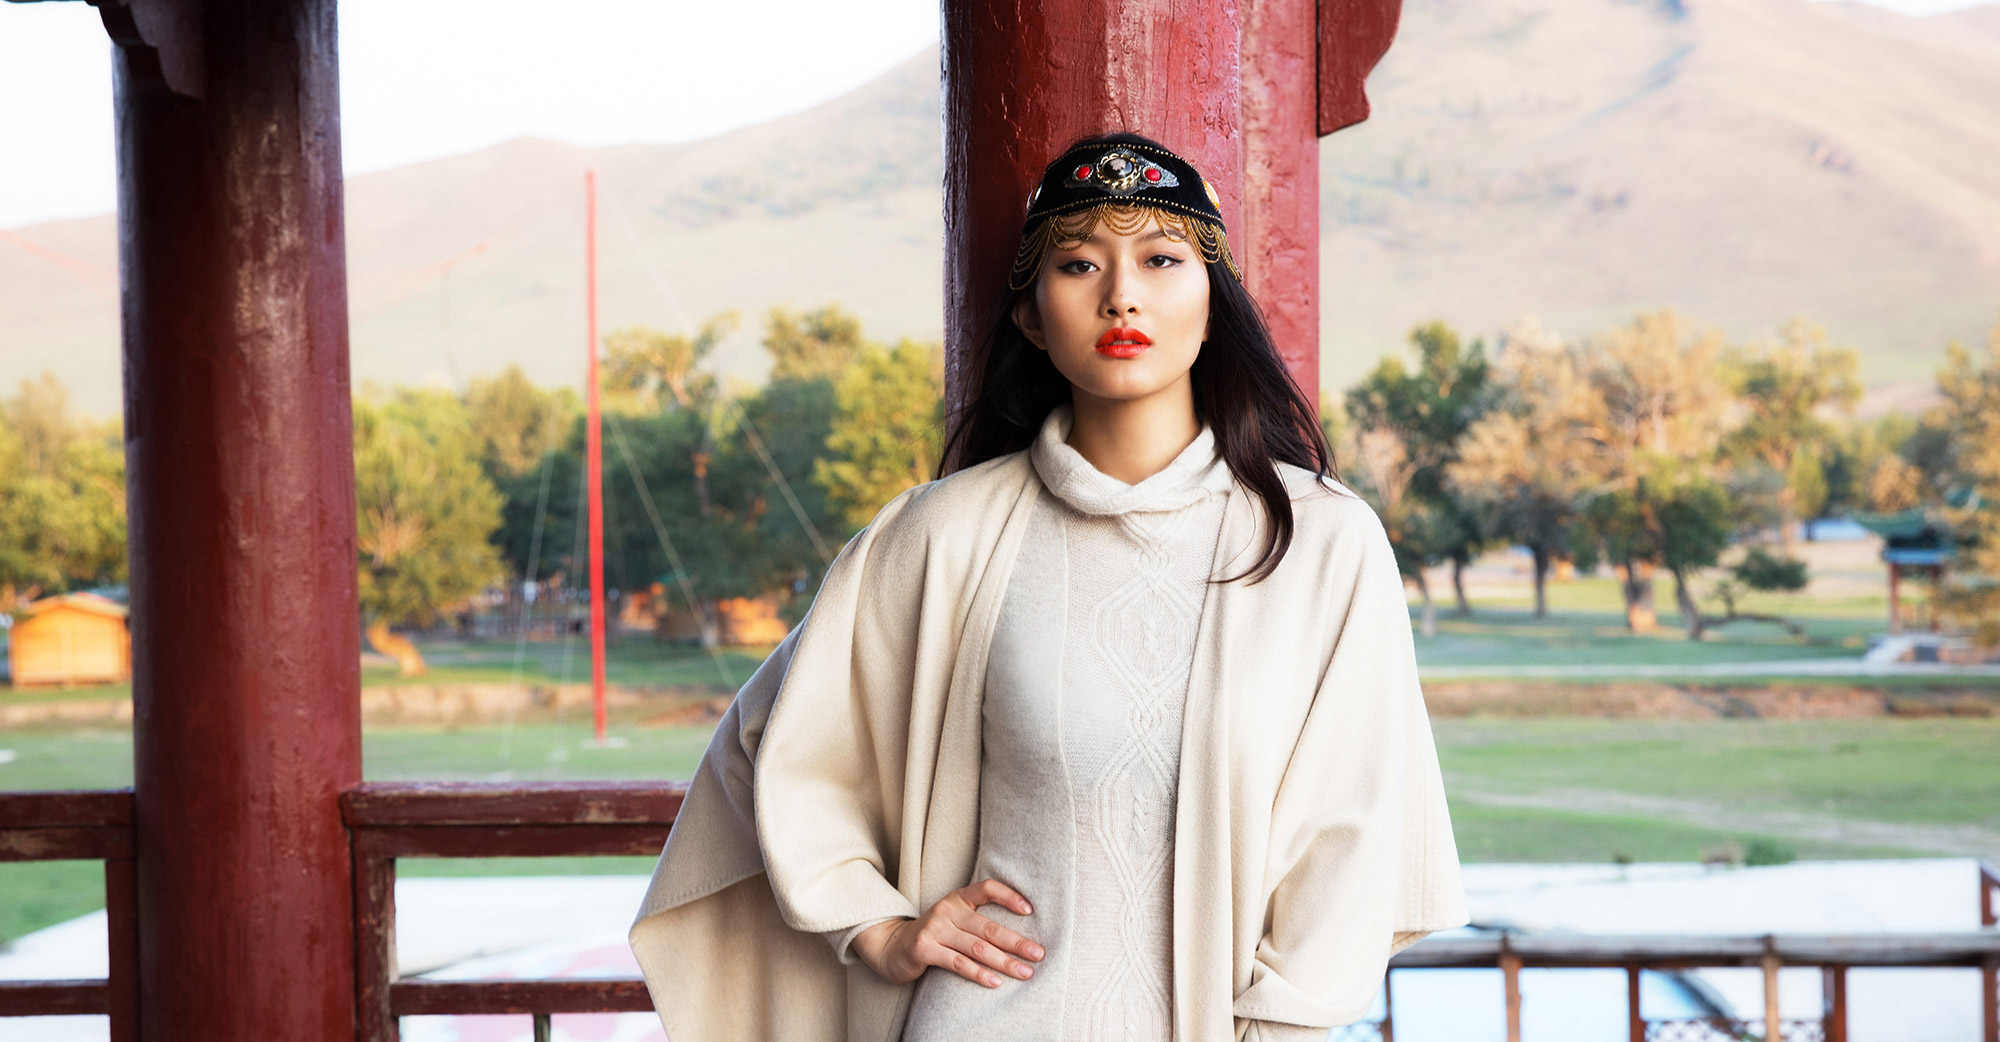 Sodgerel_Mongolie16